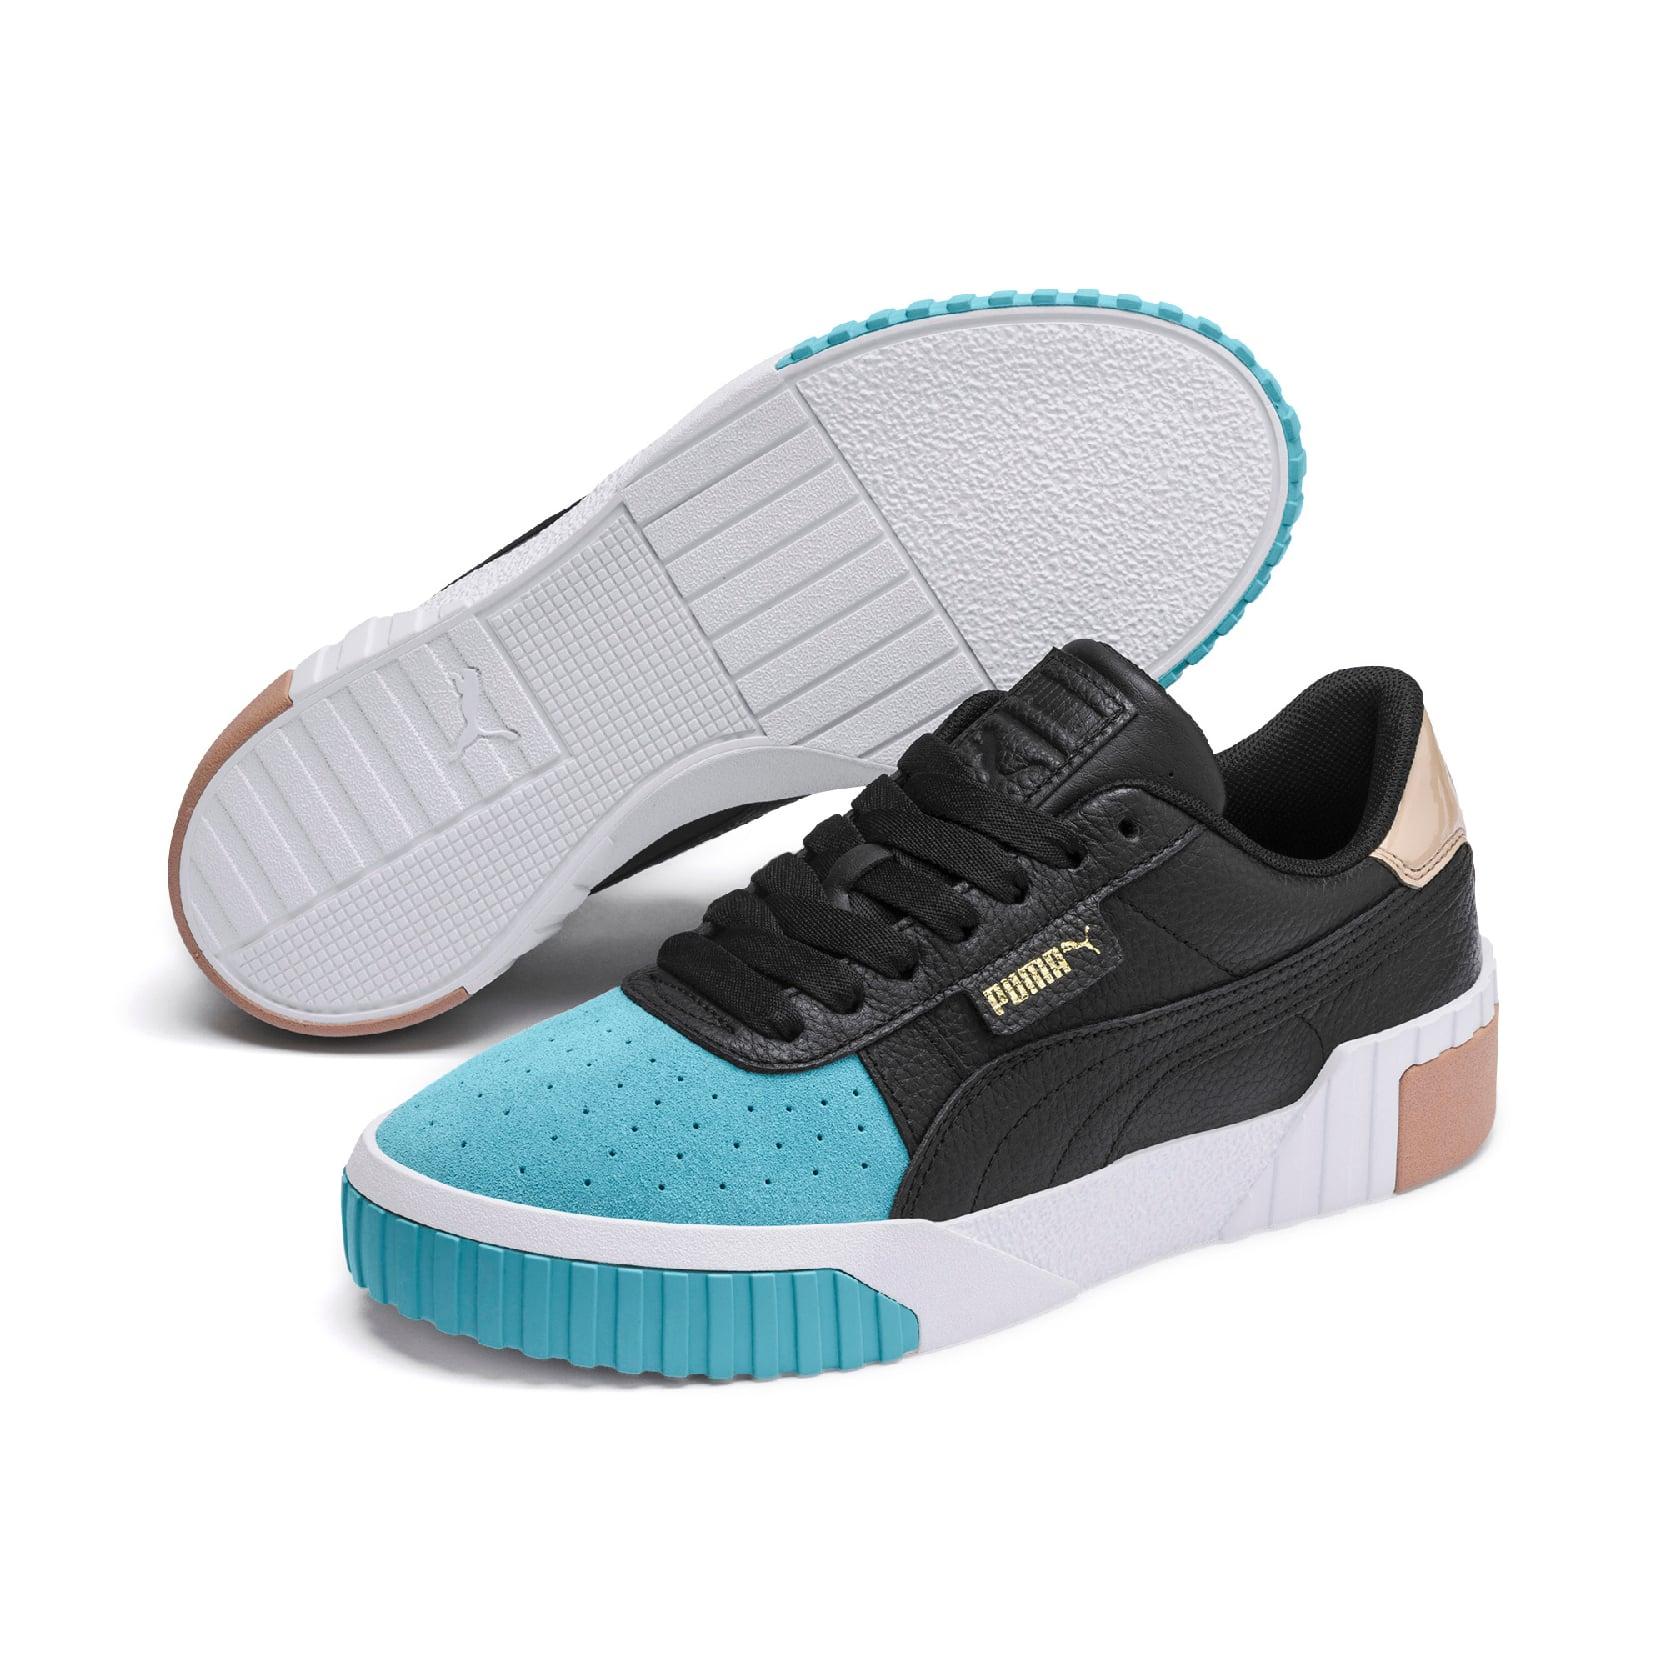 Selena Gomez Puma Cali Remix Sneaker